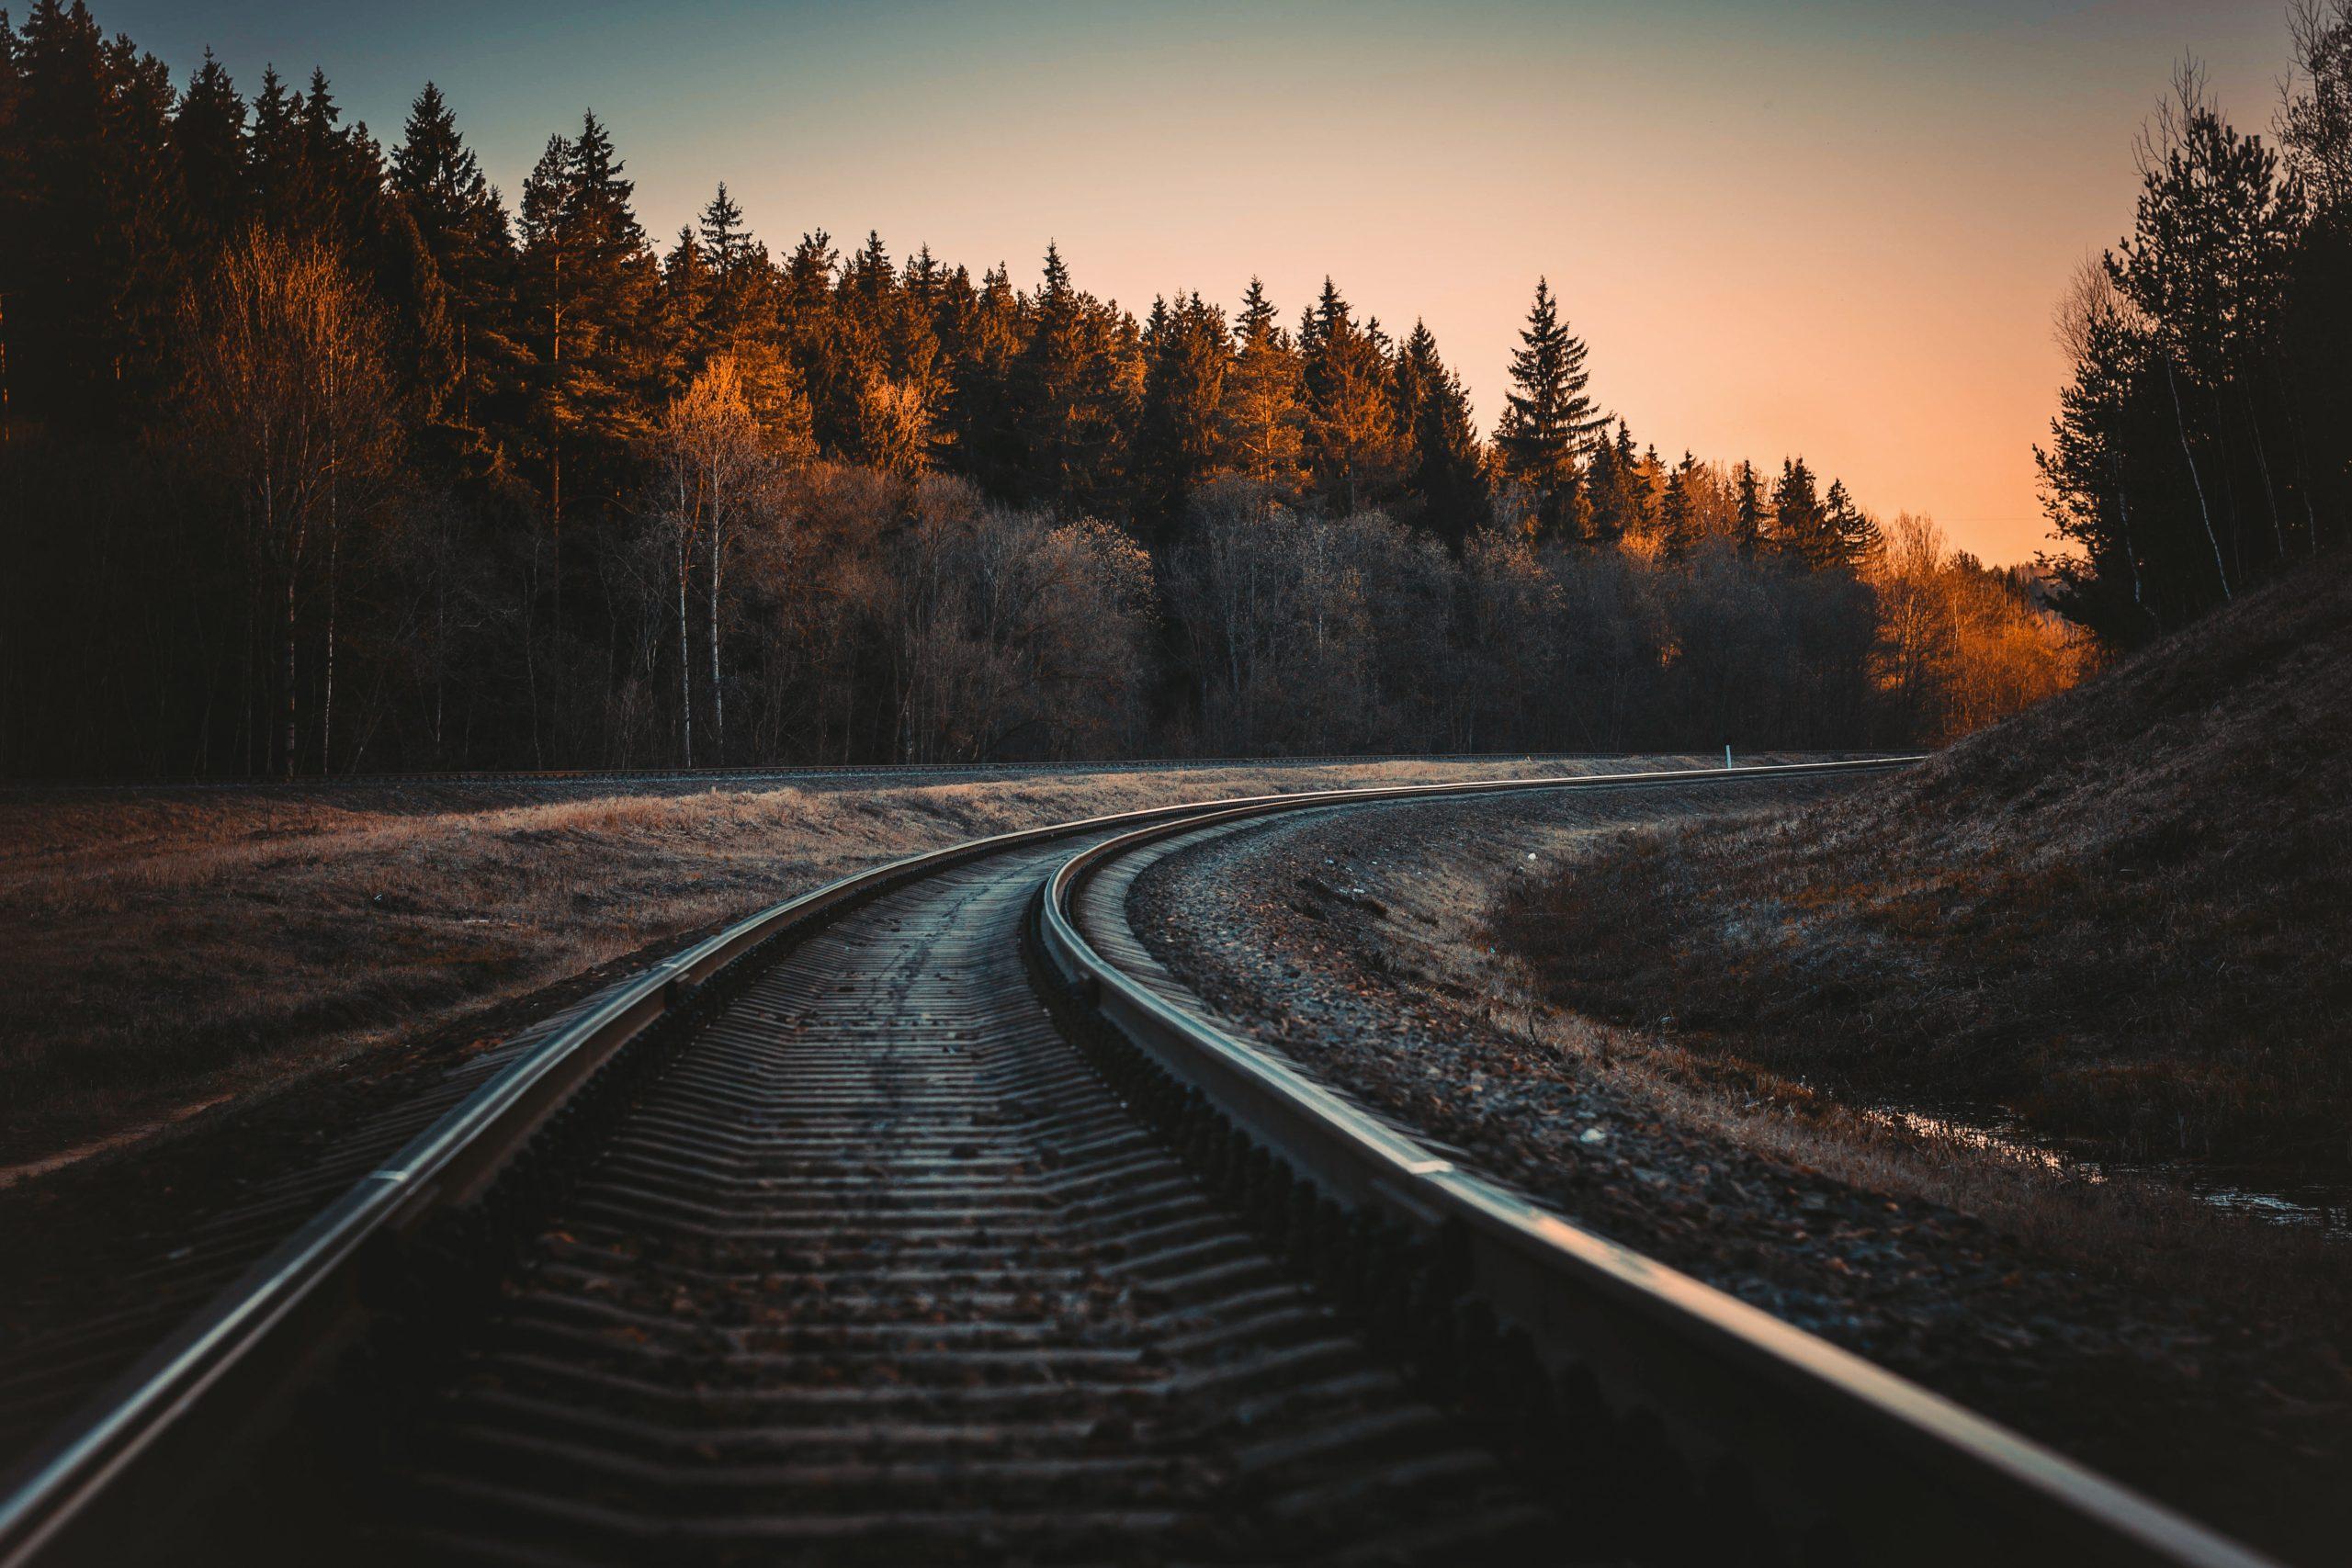 Train track curves